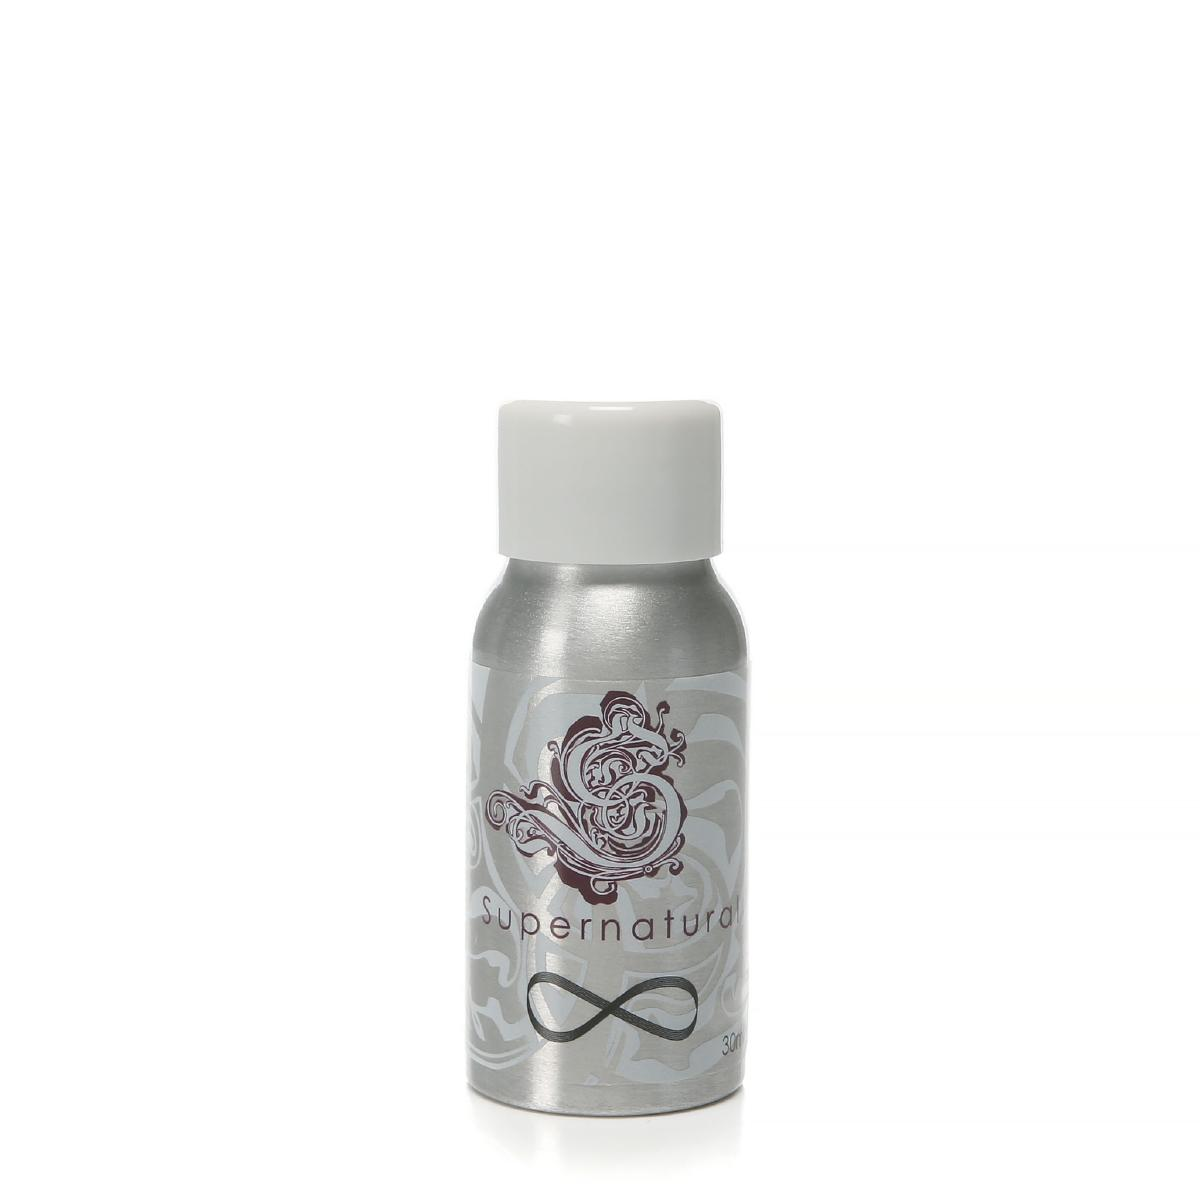 Lackförsegling Dodo Juice Supernatural Infinity Paint Sealant Kit, 30 ml